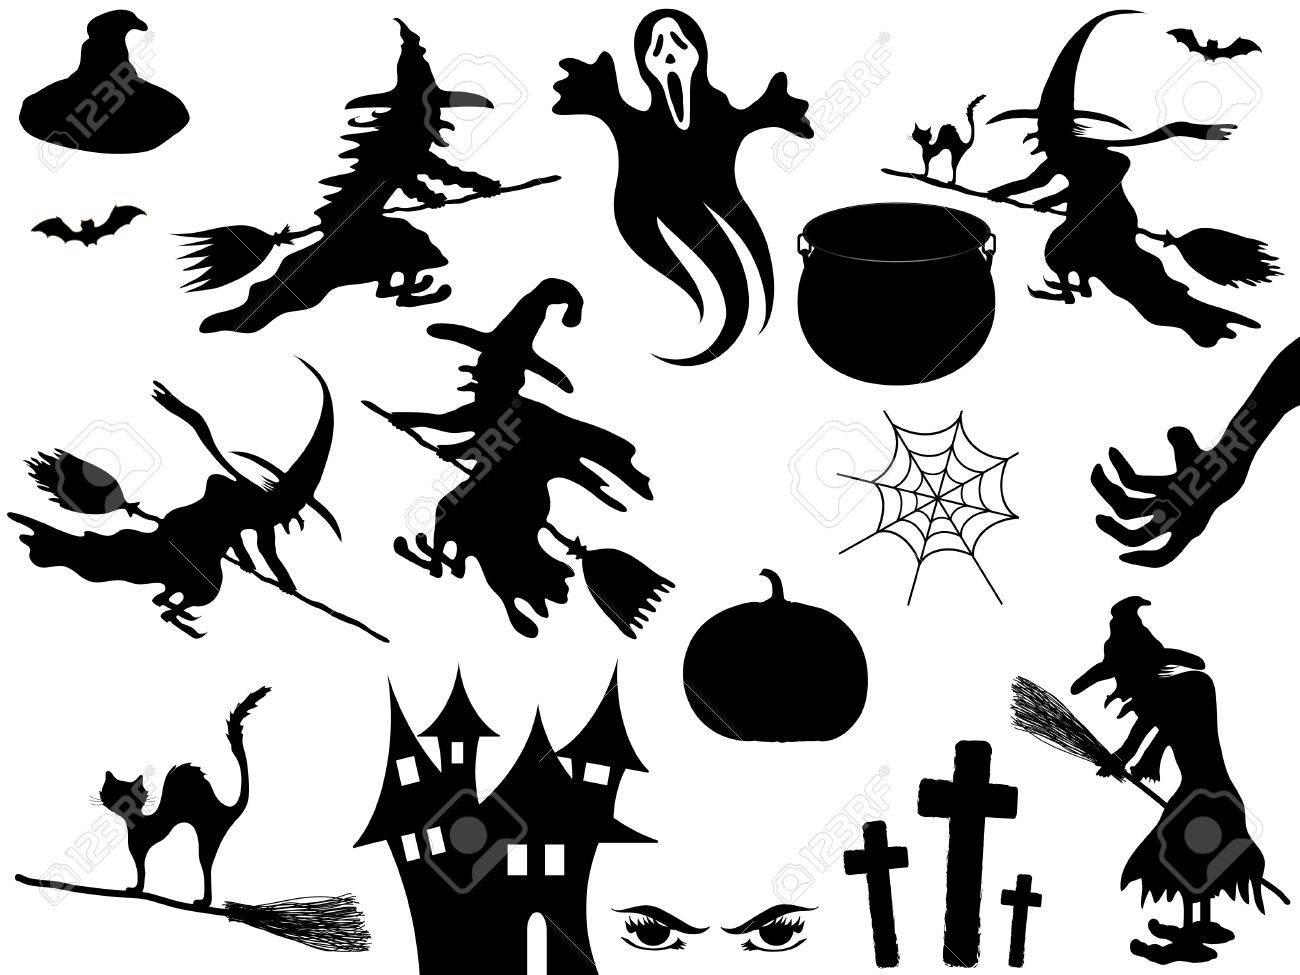 6,990 Cauldron Stock Vector Illustration And Royalty Free Cauldron ...